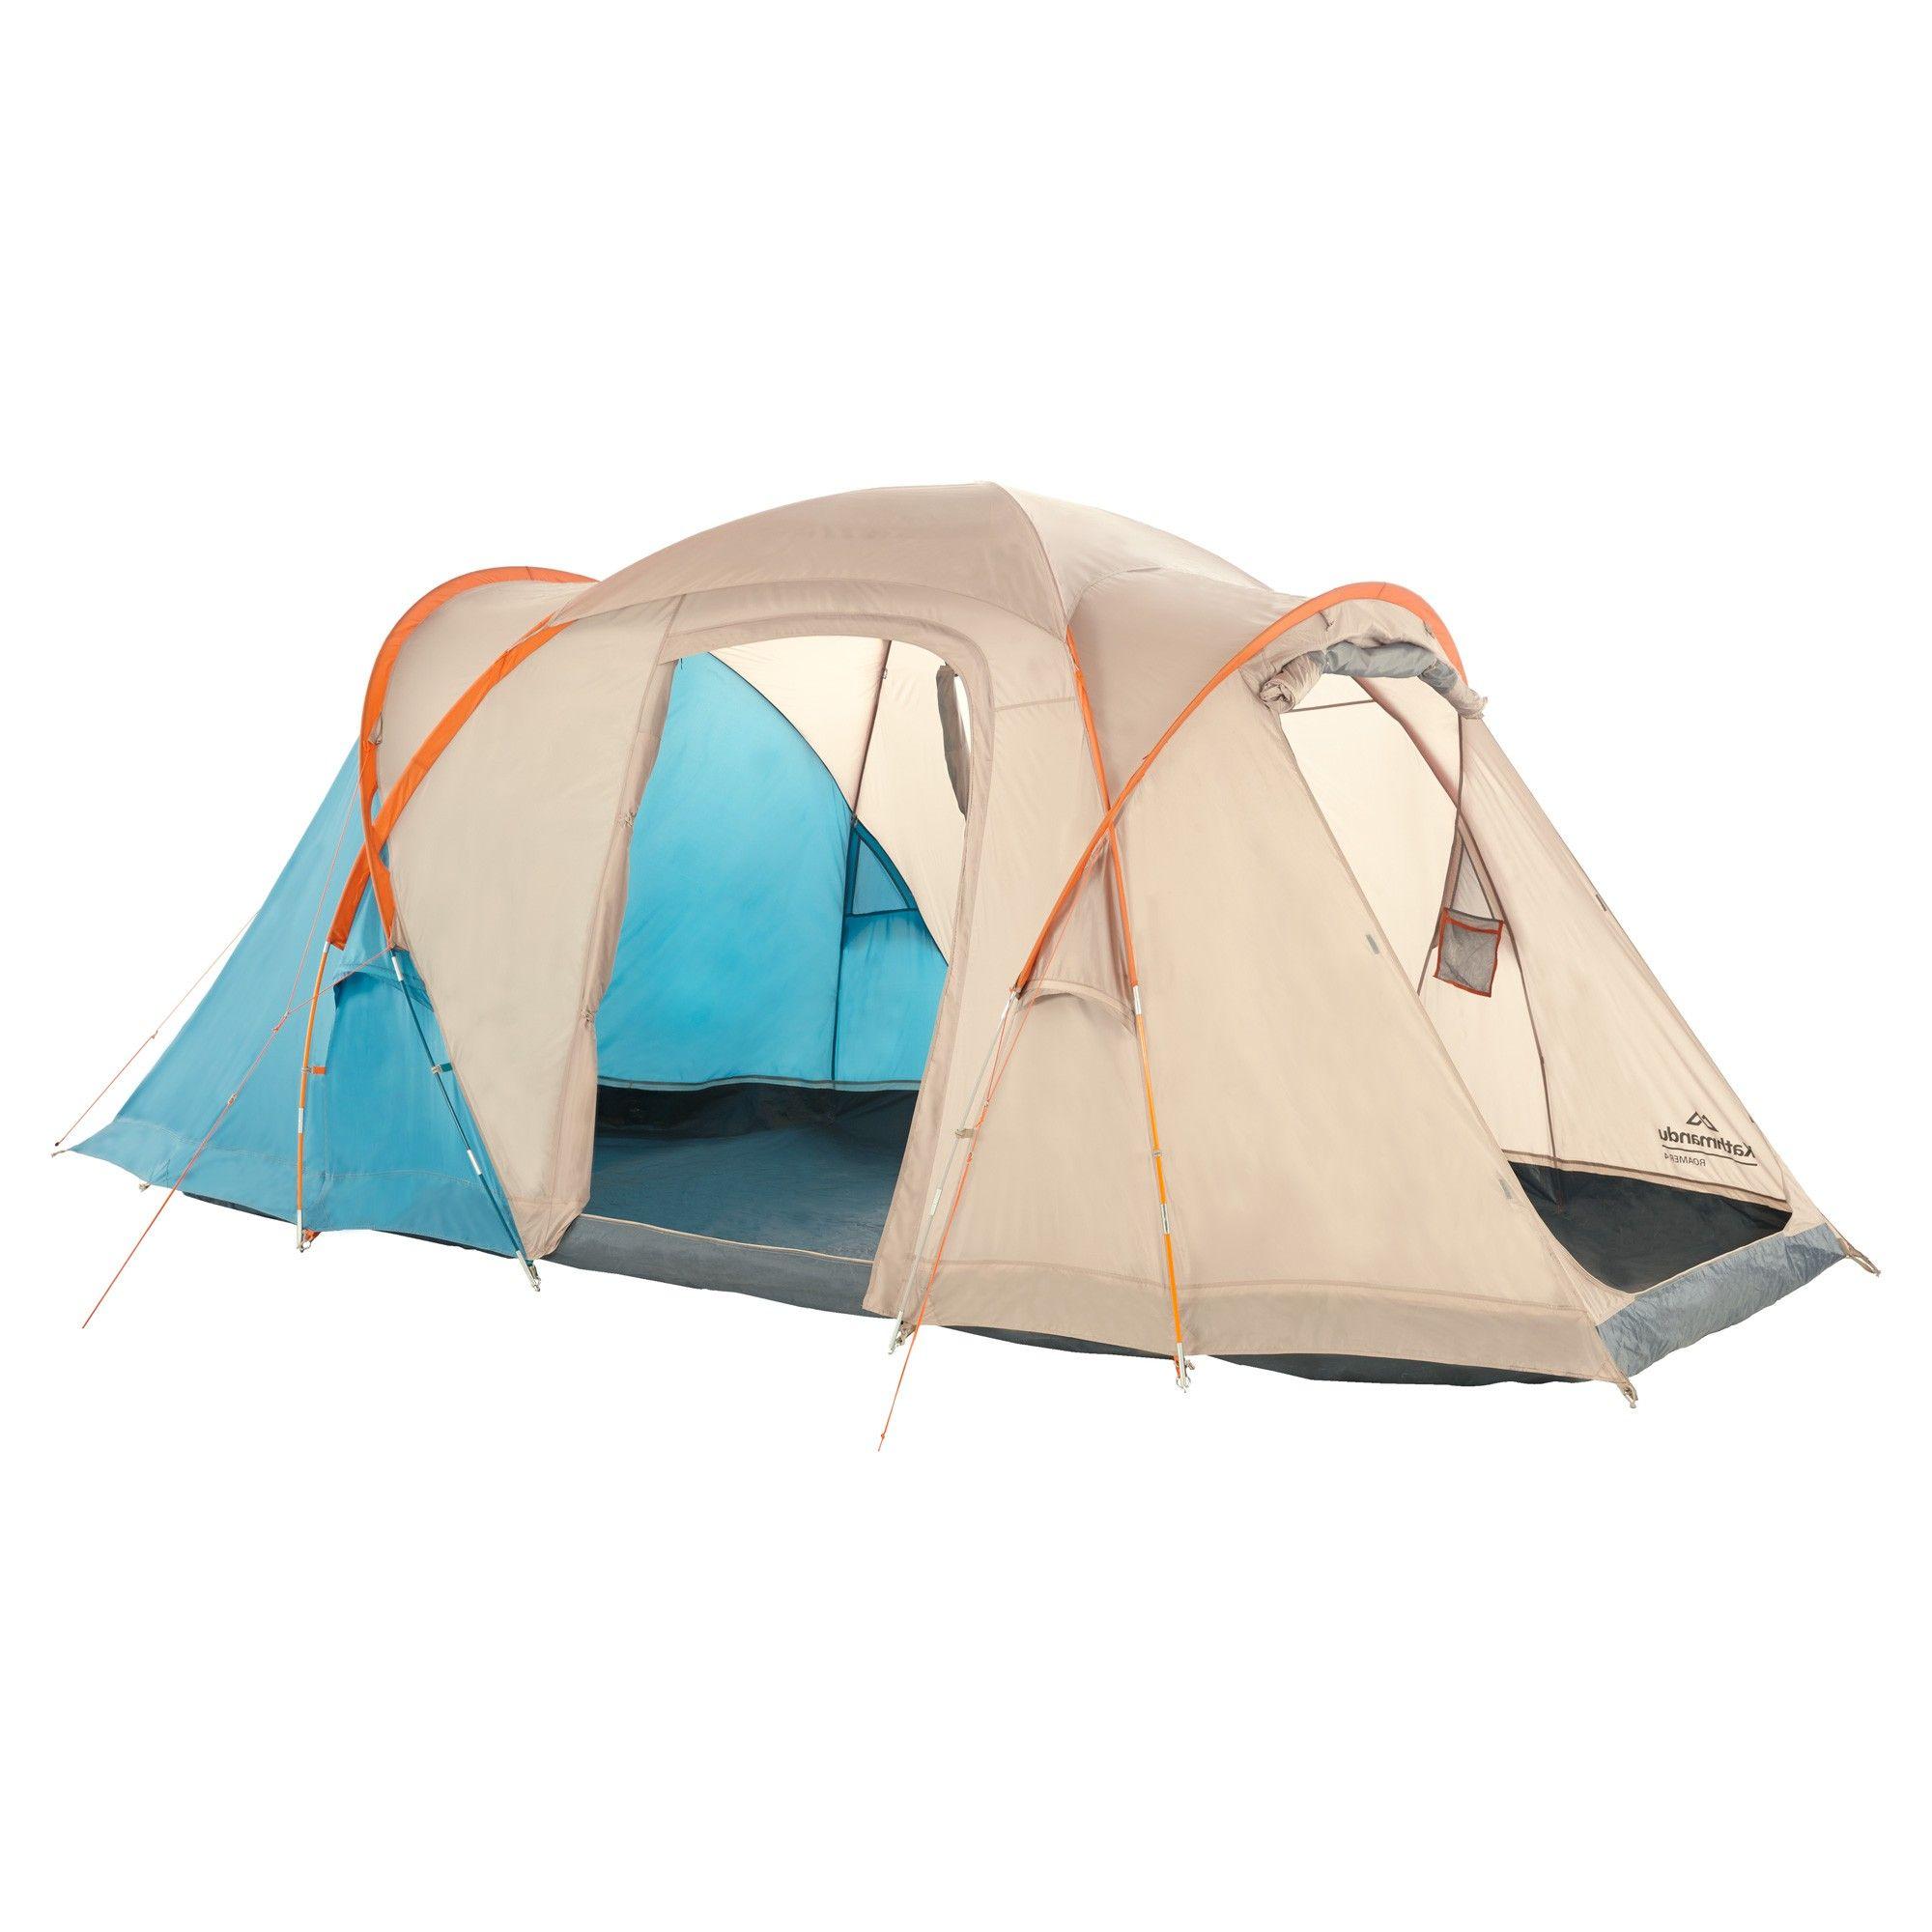 Buy Roamer 4 Person Tent - Honey/Blue Lagoon online at Kathmandu  sc 1 st  Pinterest & Buy Roamer 4 Person Tent - Honey/Blue Lagoon online at Kathmandu ...